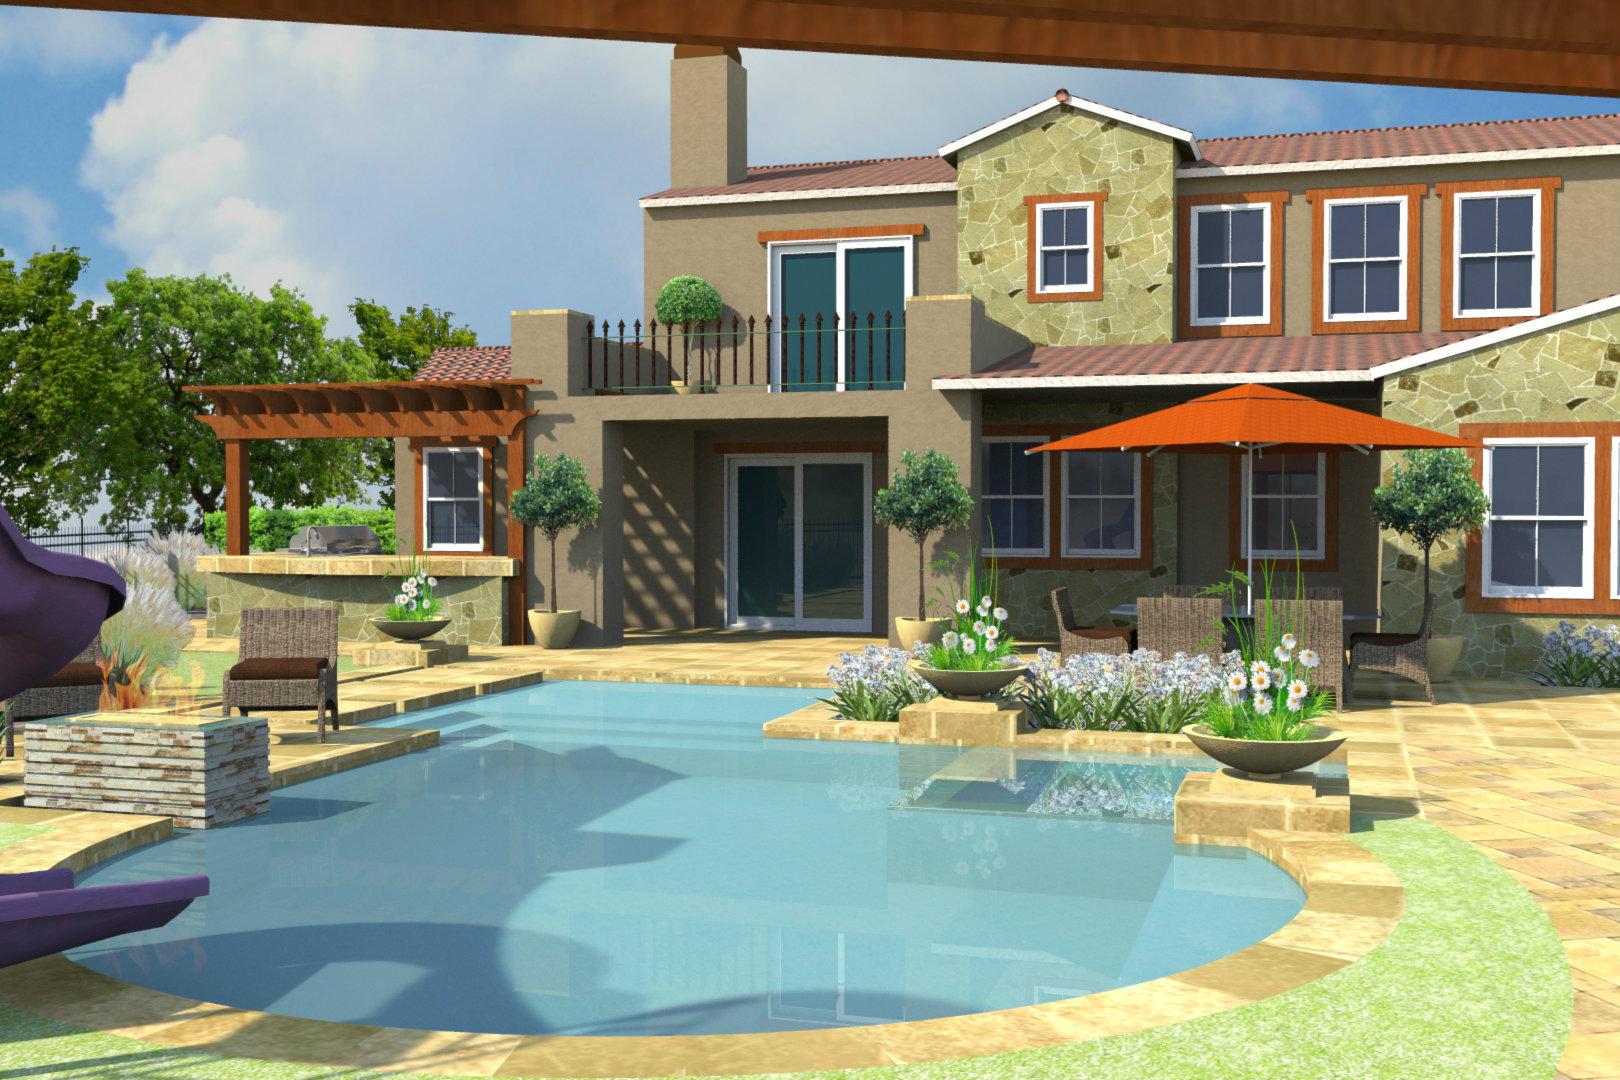 Virtual Yard Design Free: Presenting Virtual Backyard